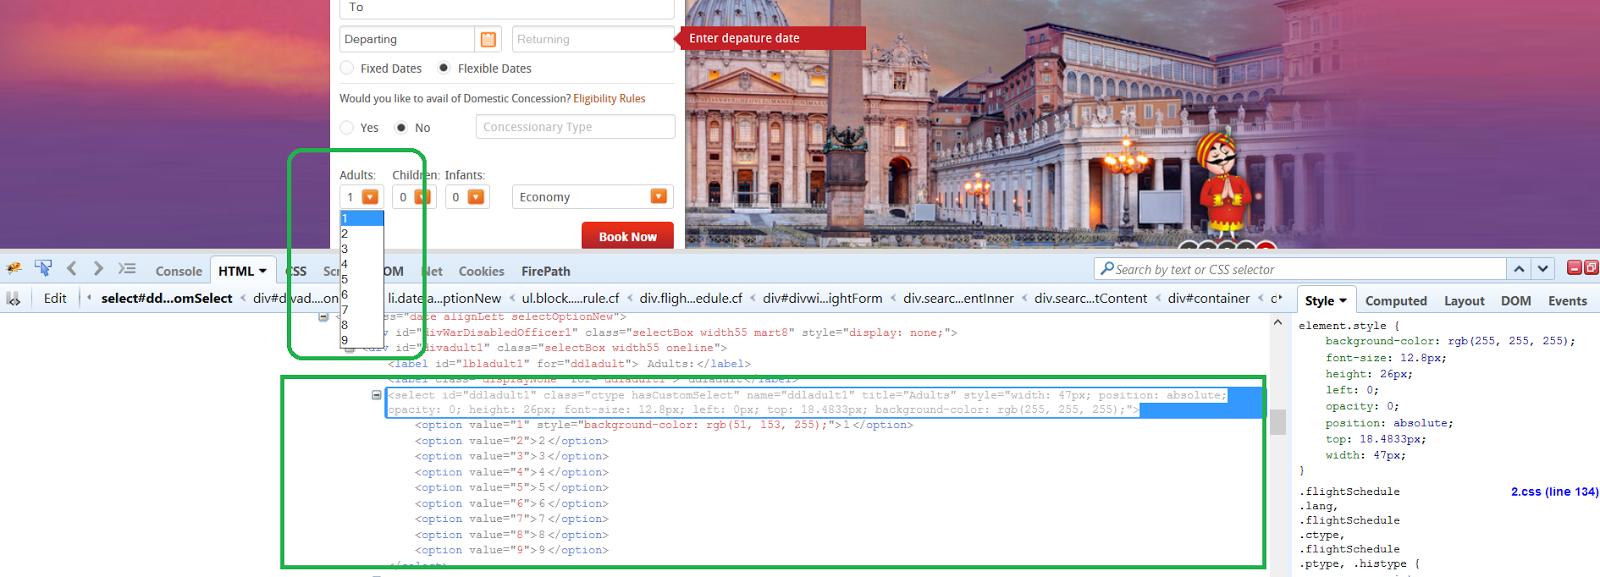 Selenium WebDriver: How To get Drop Down Values in Selenium